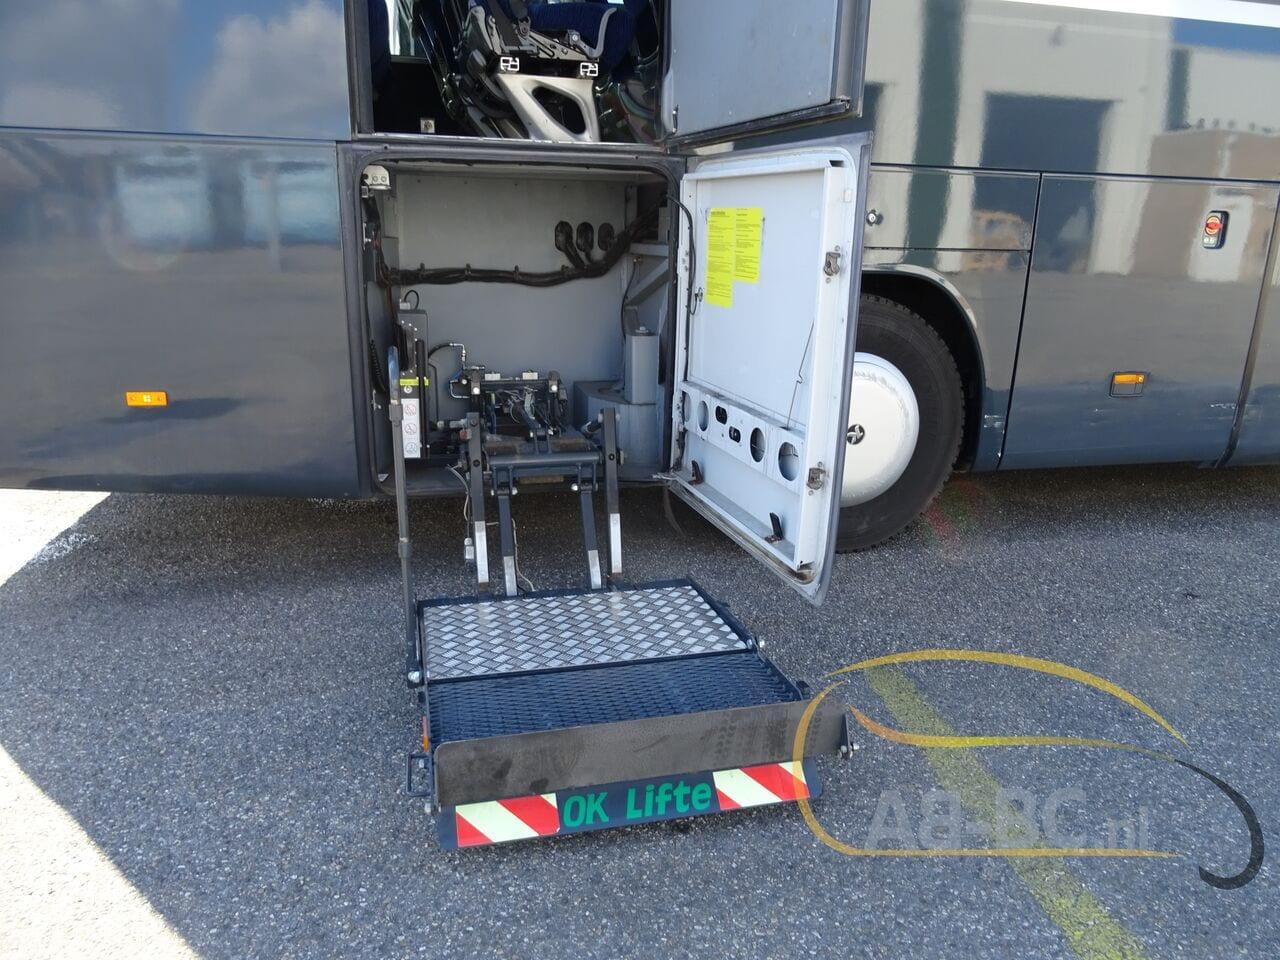 coach-busSETRA-S415-GT-HD-FINAL-EDITION-51-SEATS-LIFTBUS---1620382171245618671_big_fe732fd62d626cae239298f313b8ee84--21050713010665719300